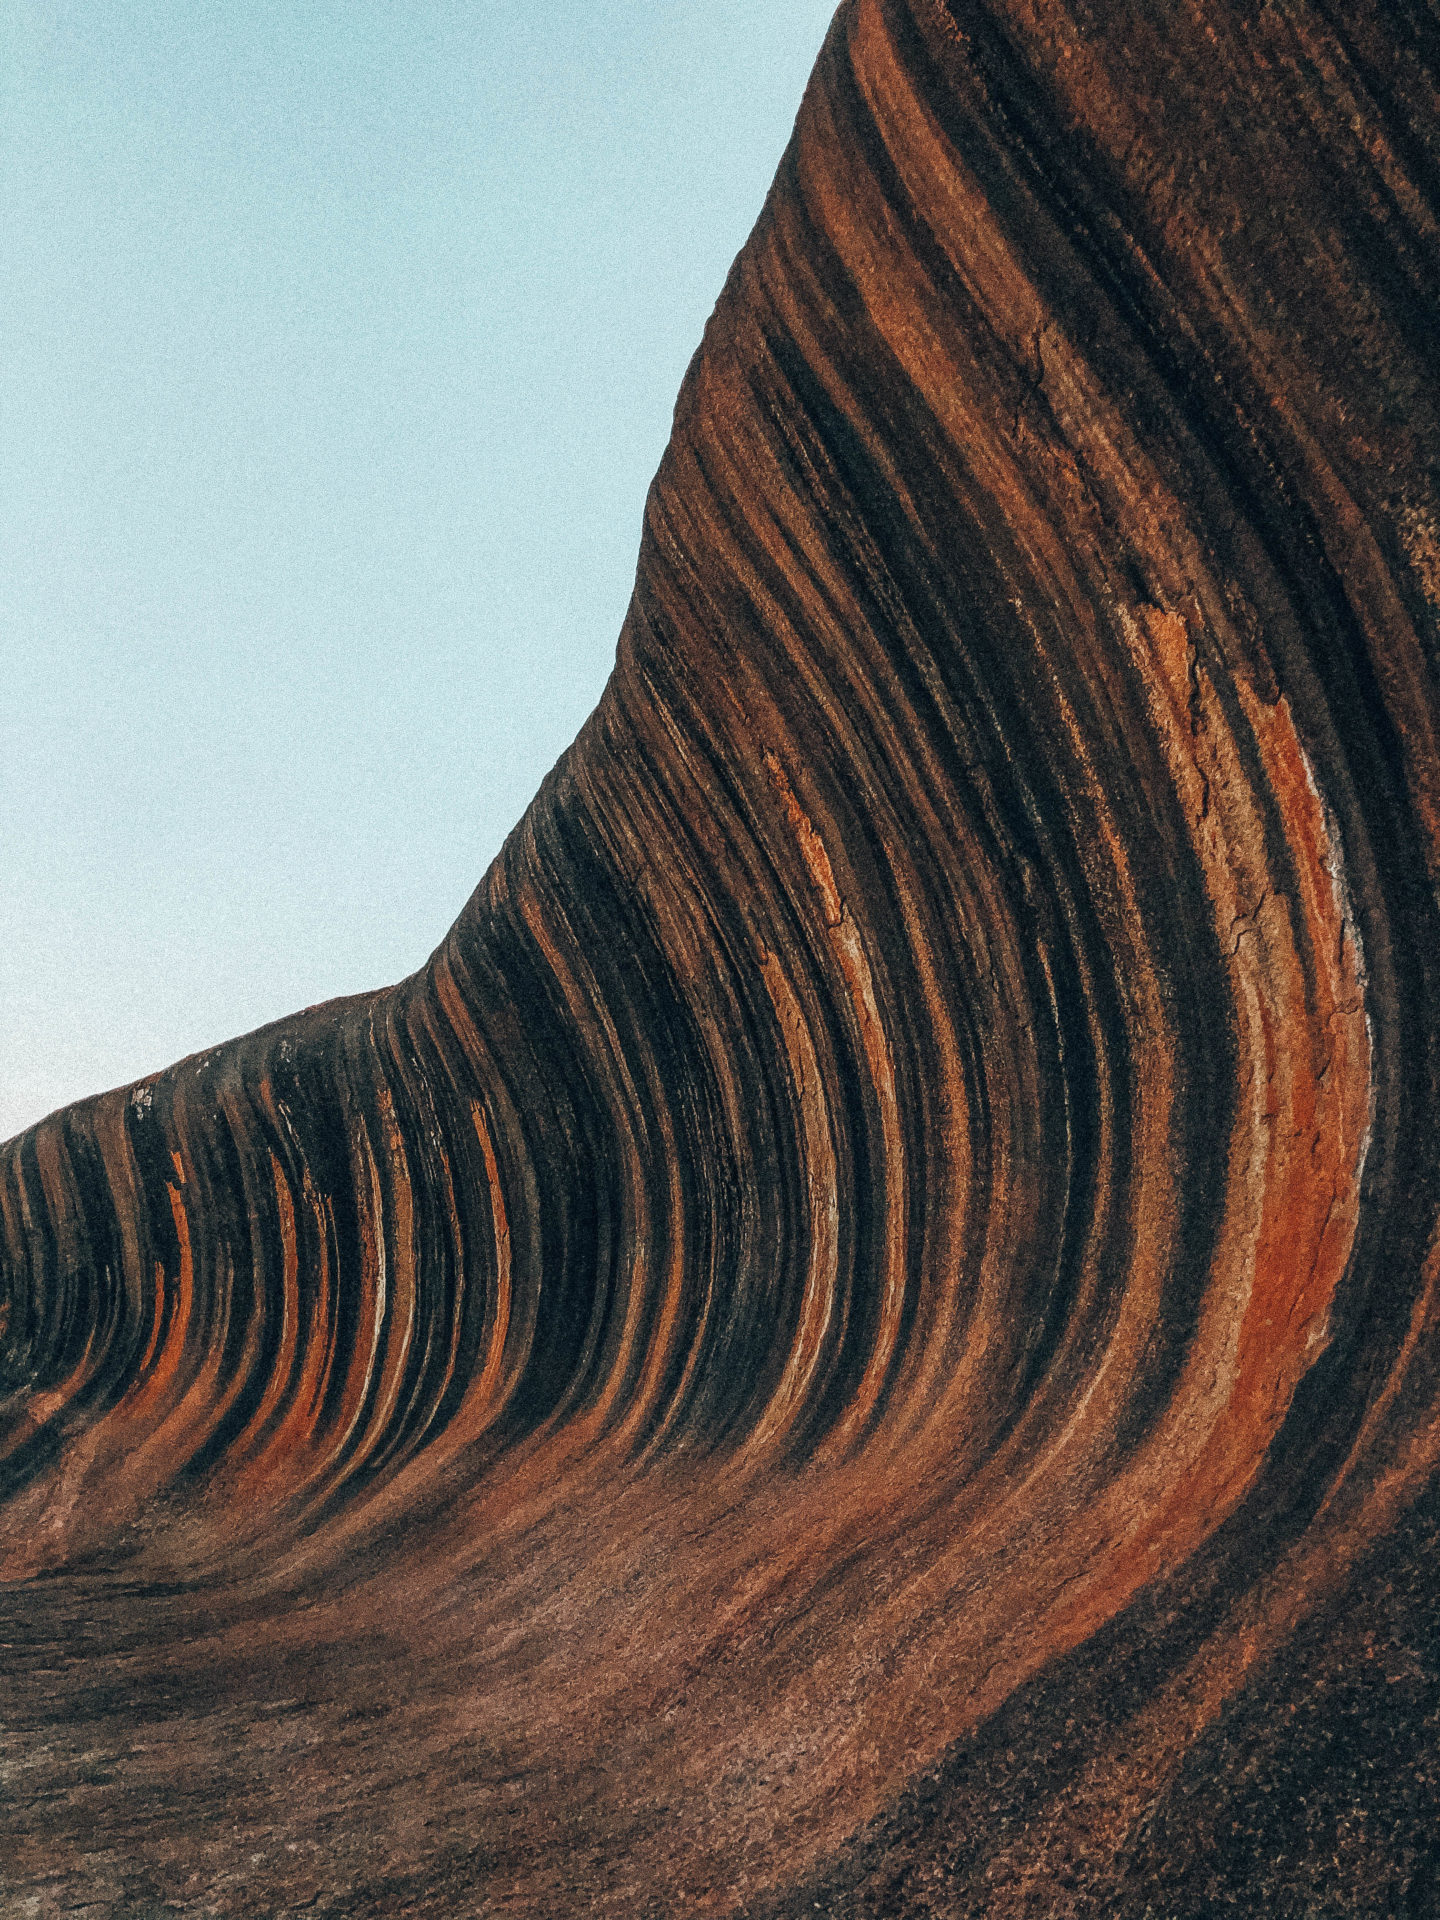 Wave Rock, Western Australia - Blondie Baby blog mode et voyages